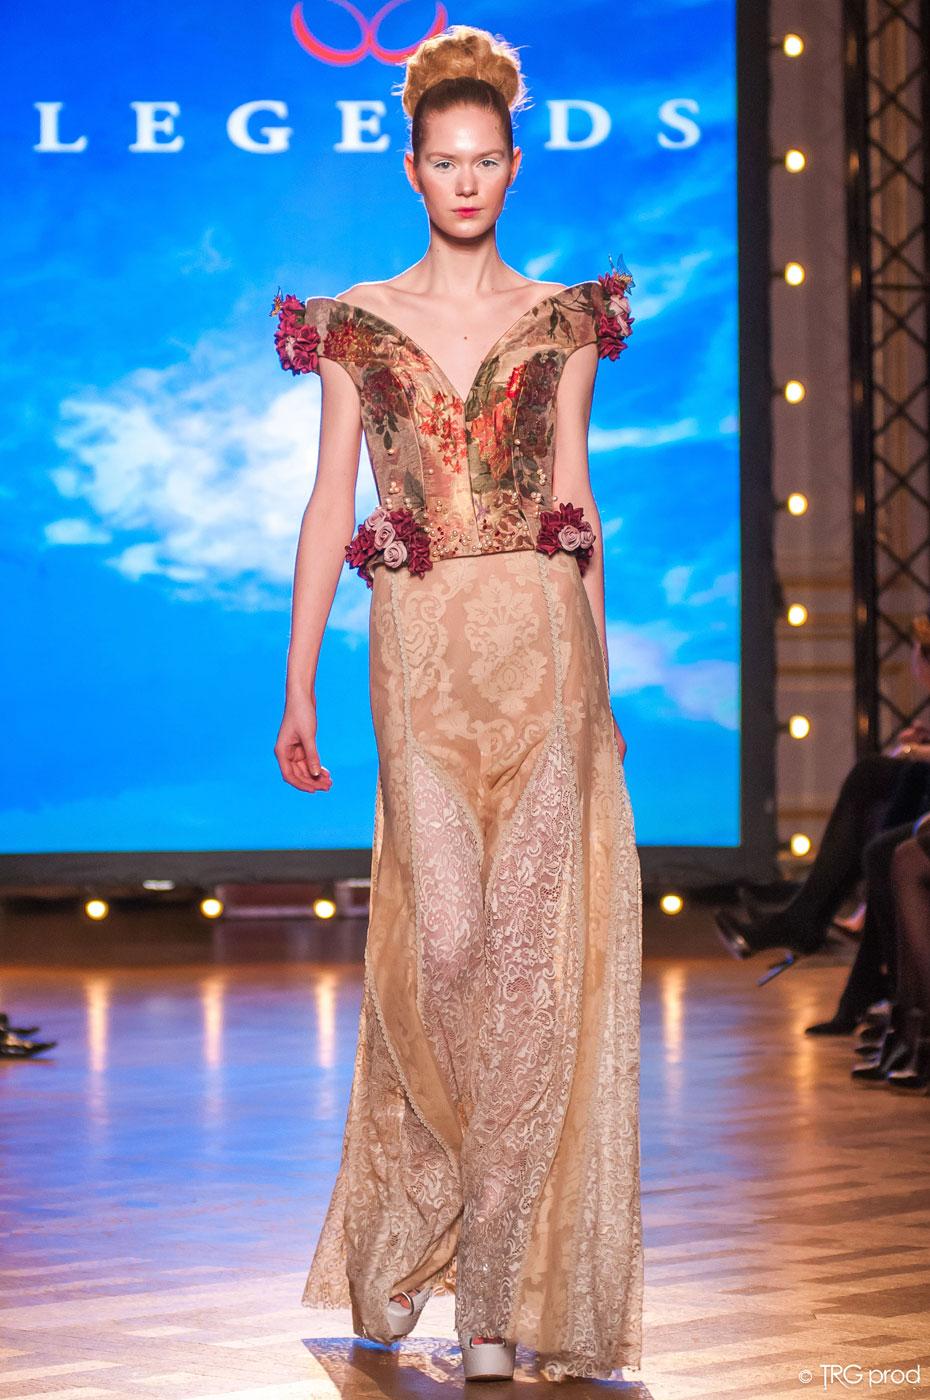 Legends-fashion-runway-show-haute-couture-paris-spring-2015-the-impression-11